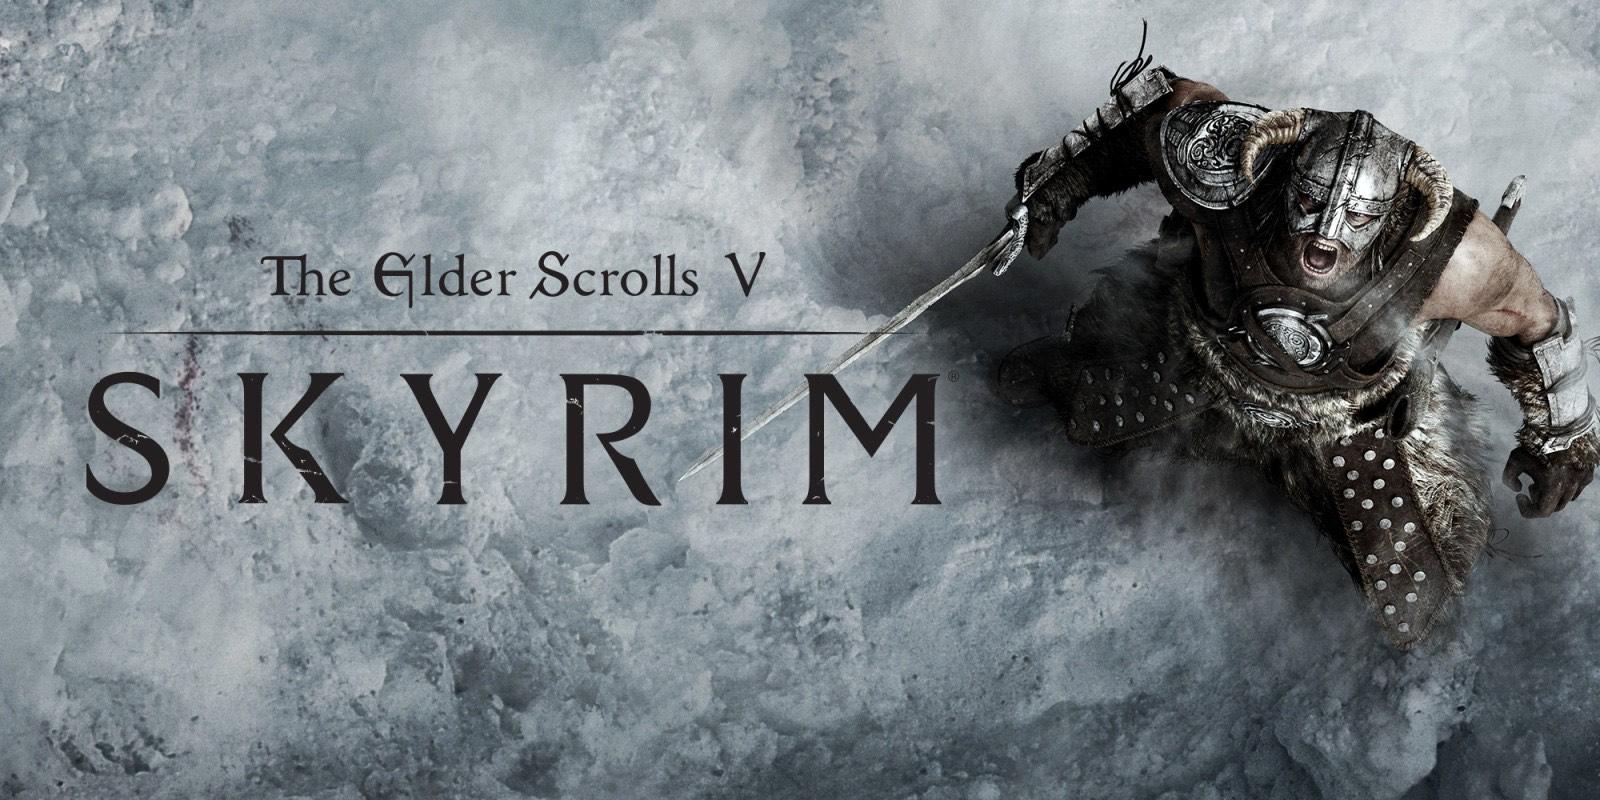 The Elder Scrolls V: Skyrim (Nintendo Switch) für 29,99€ im Nintendo eShop